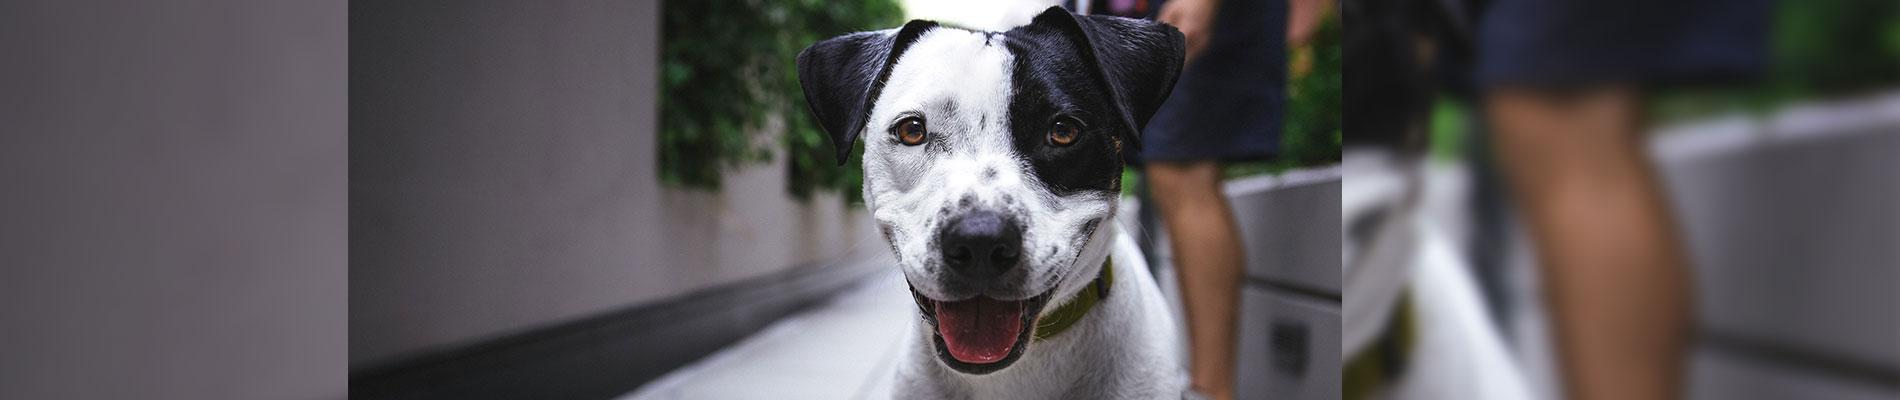 Smoochie Pooch is top dog groomers in Auburn IN